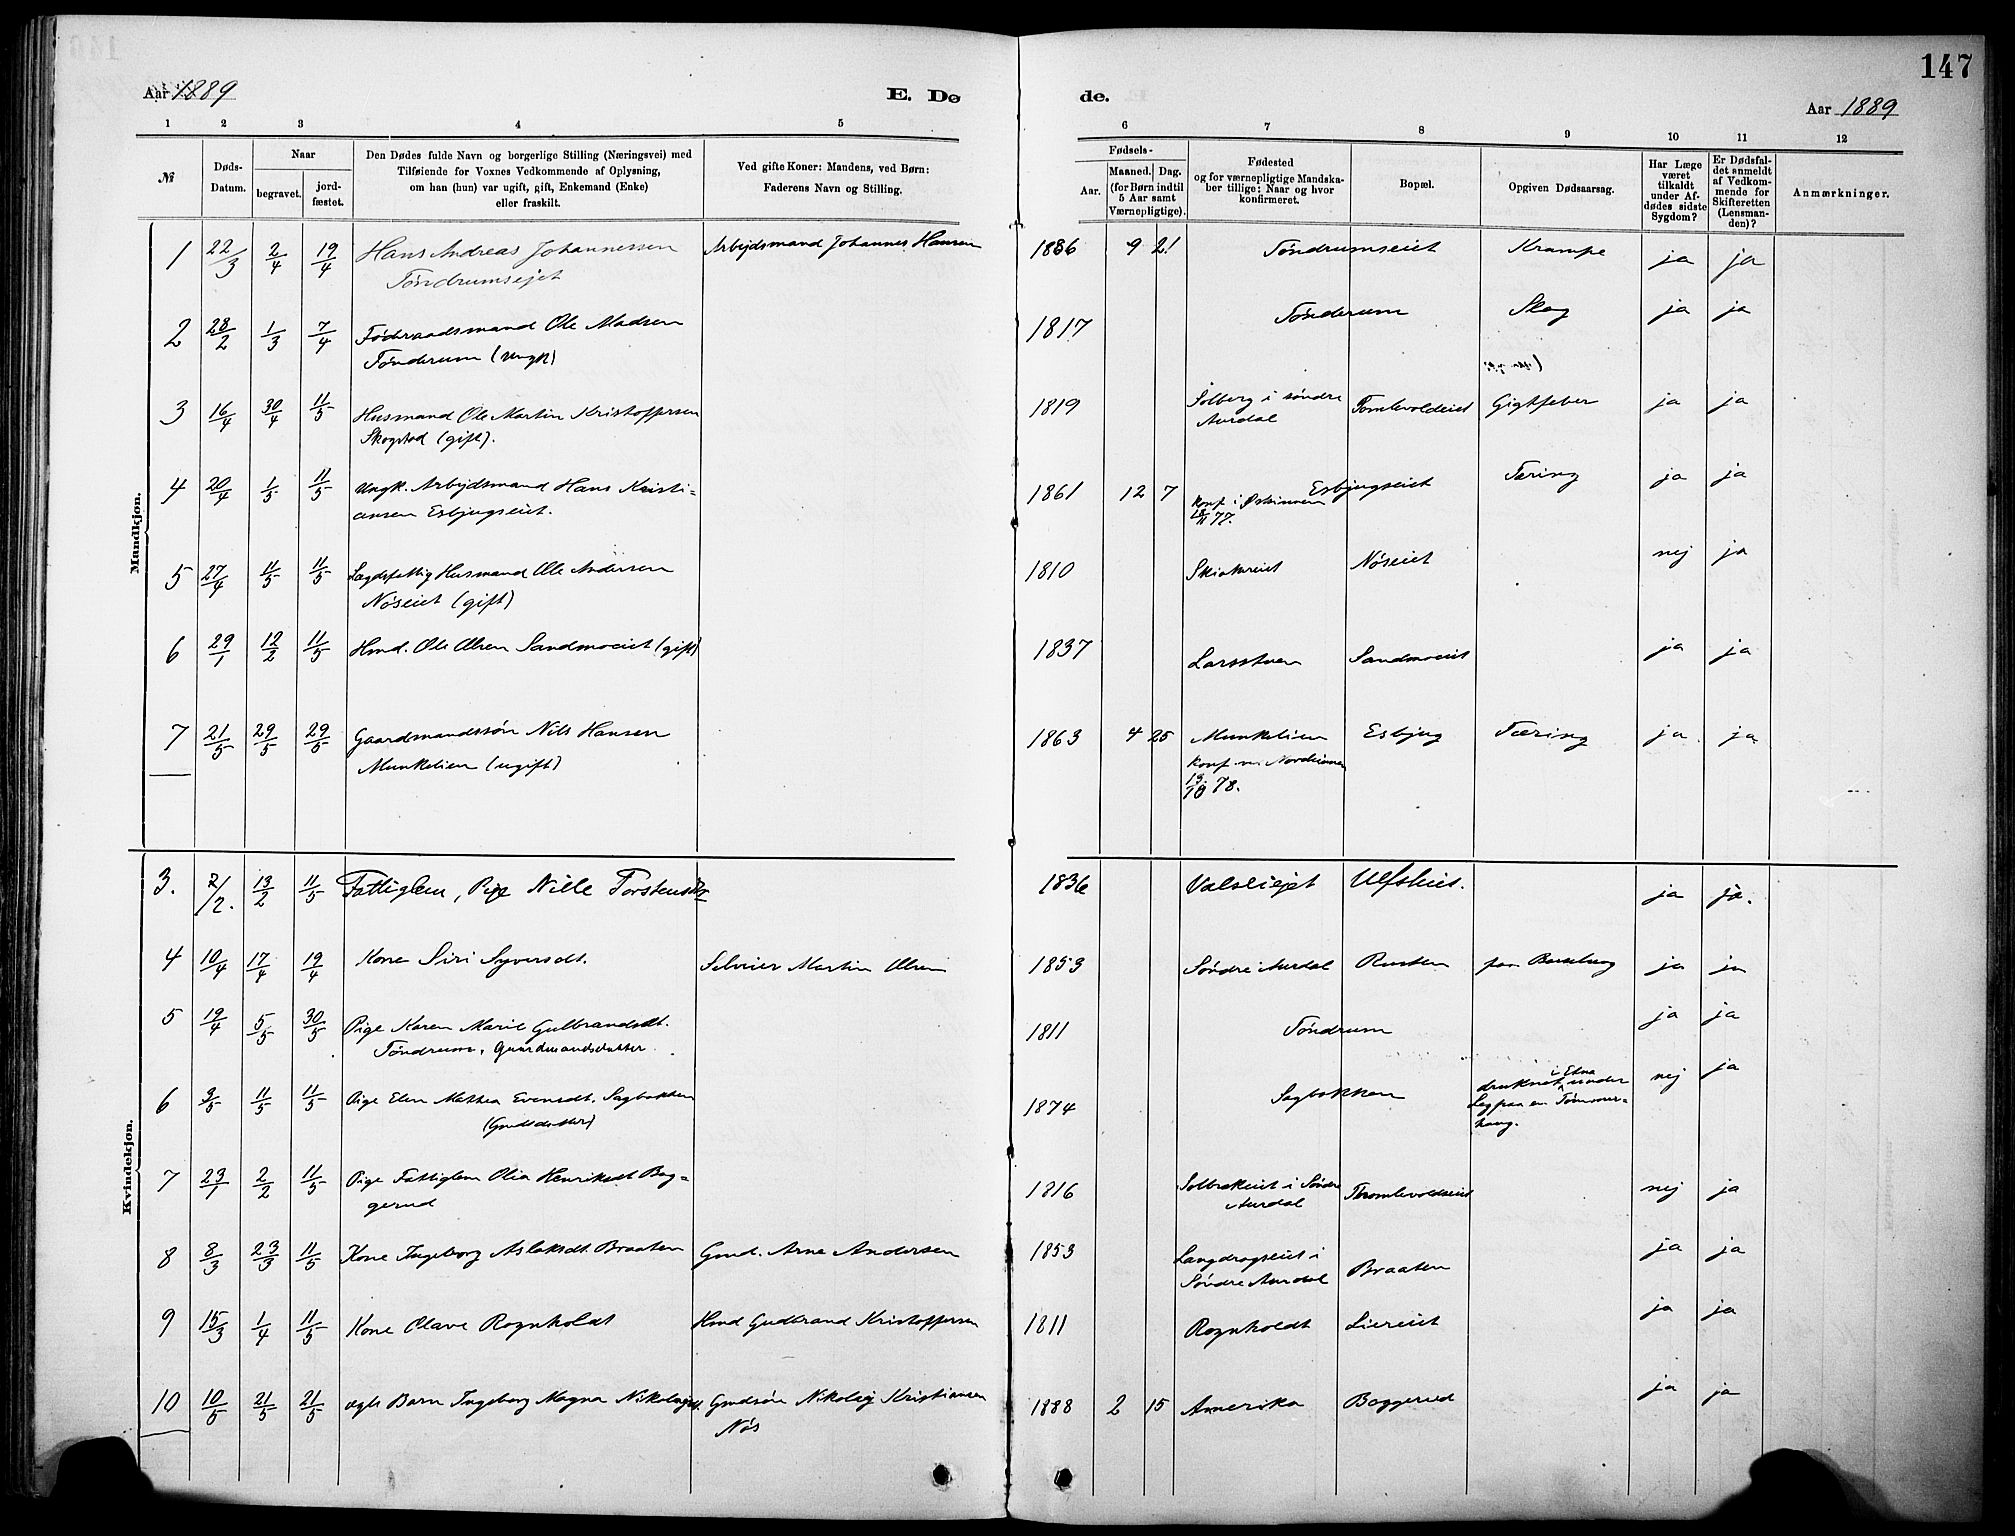 SAH, Nordre Land prestekontor, Ministerialbok nr. 5, 1882-1903, s. 147